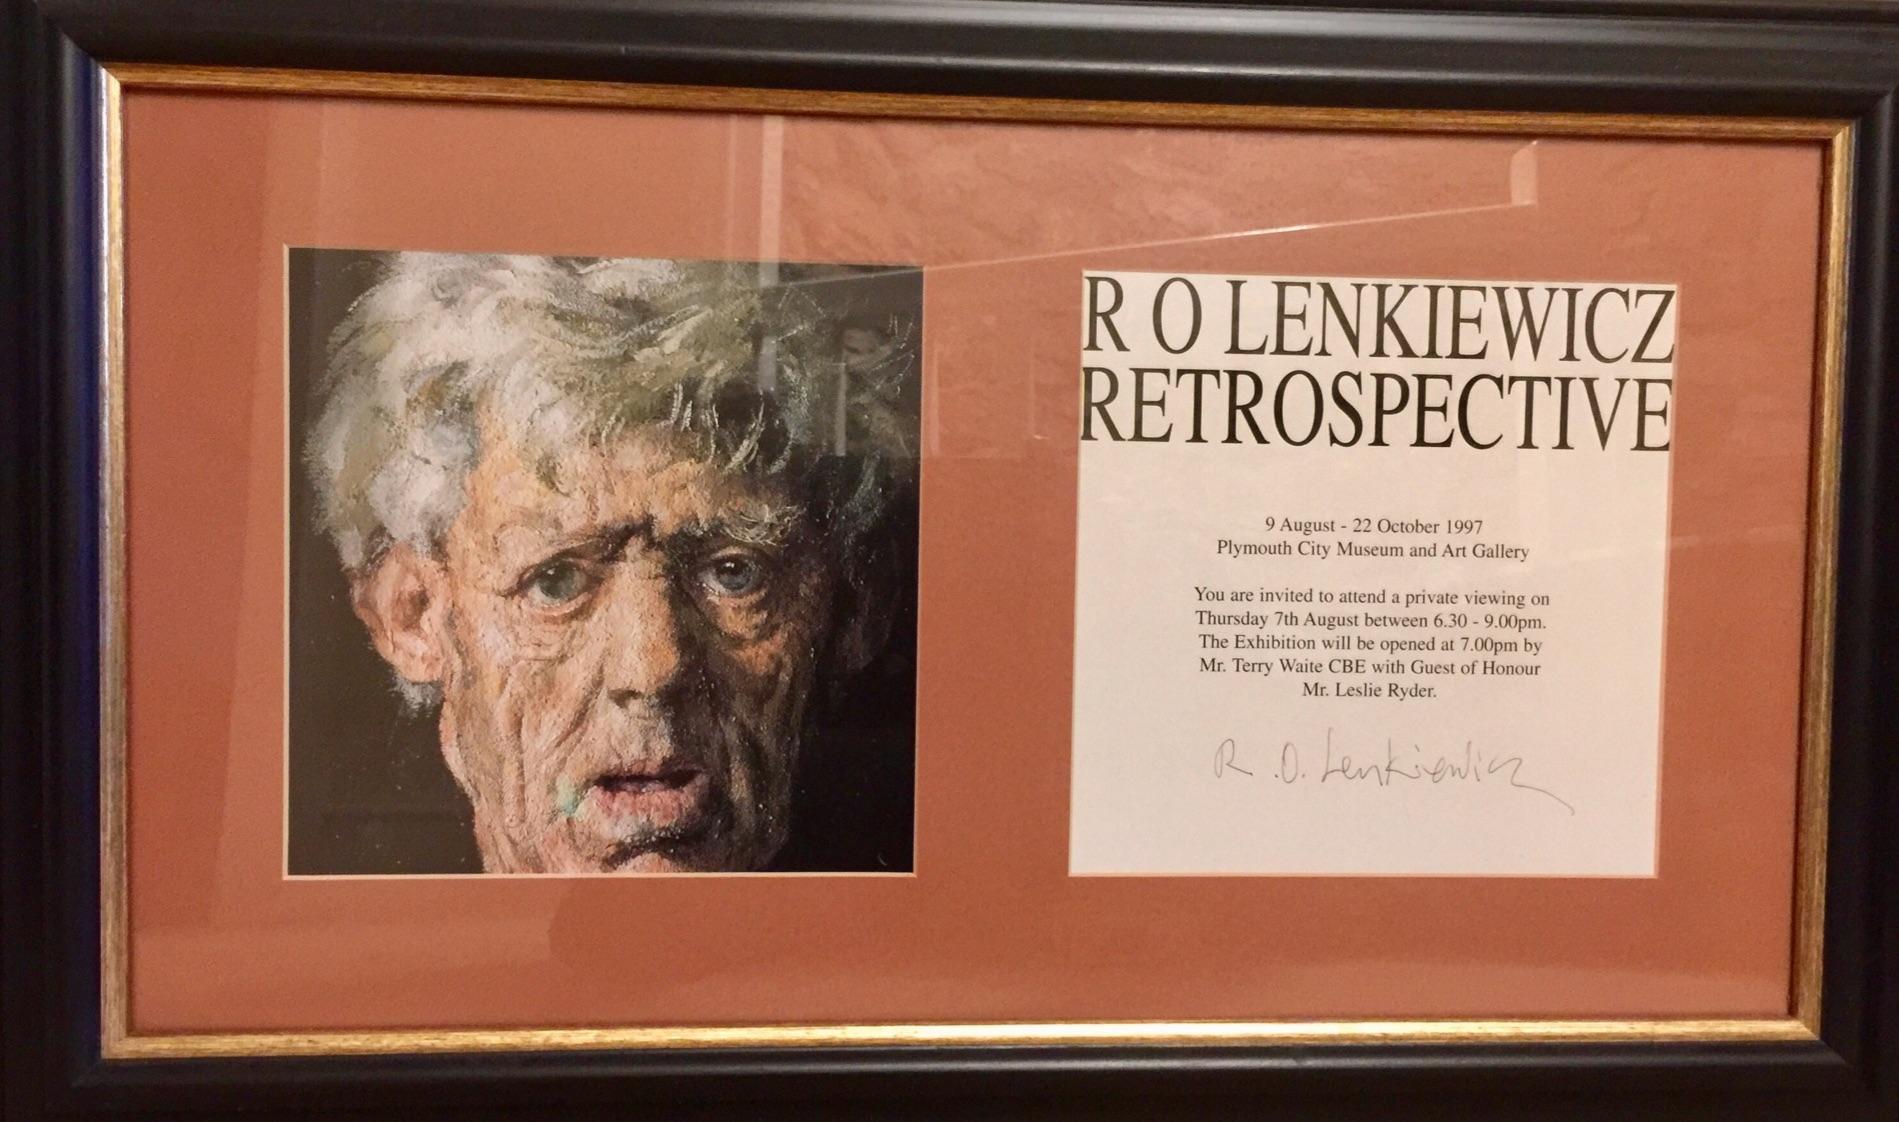 Lot 016 - Robert Lenkiewicz (1941-2002), print 'Snowy, Retrospective' (frame size 60cm x 38cm).